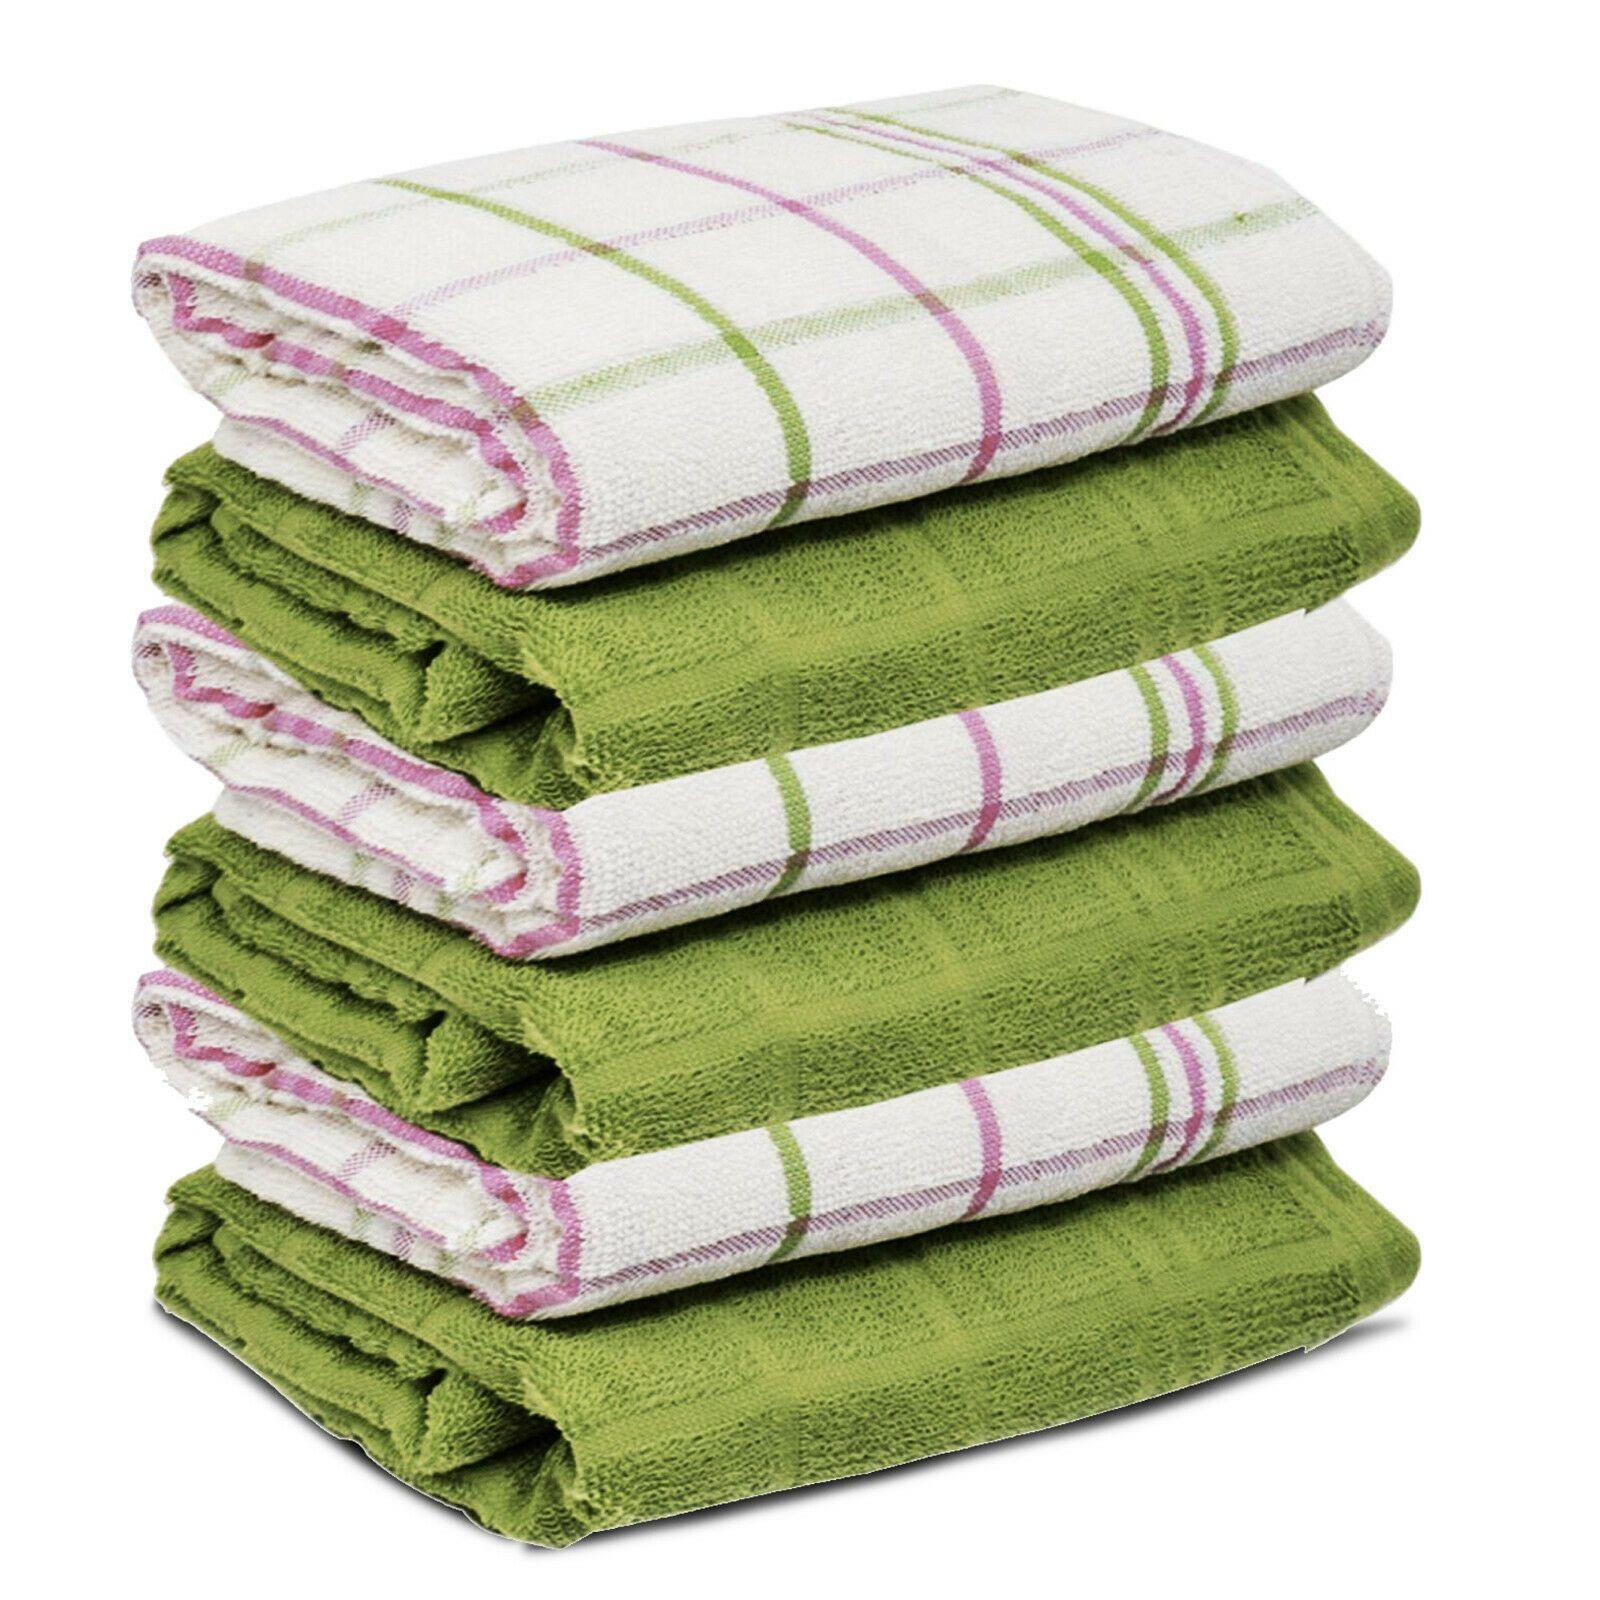 50x Dish Cloths Wash Towel Absorbent Dishcloth Kitchen Dish Towels Dish Rags